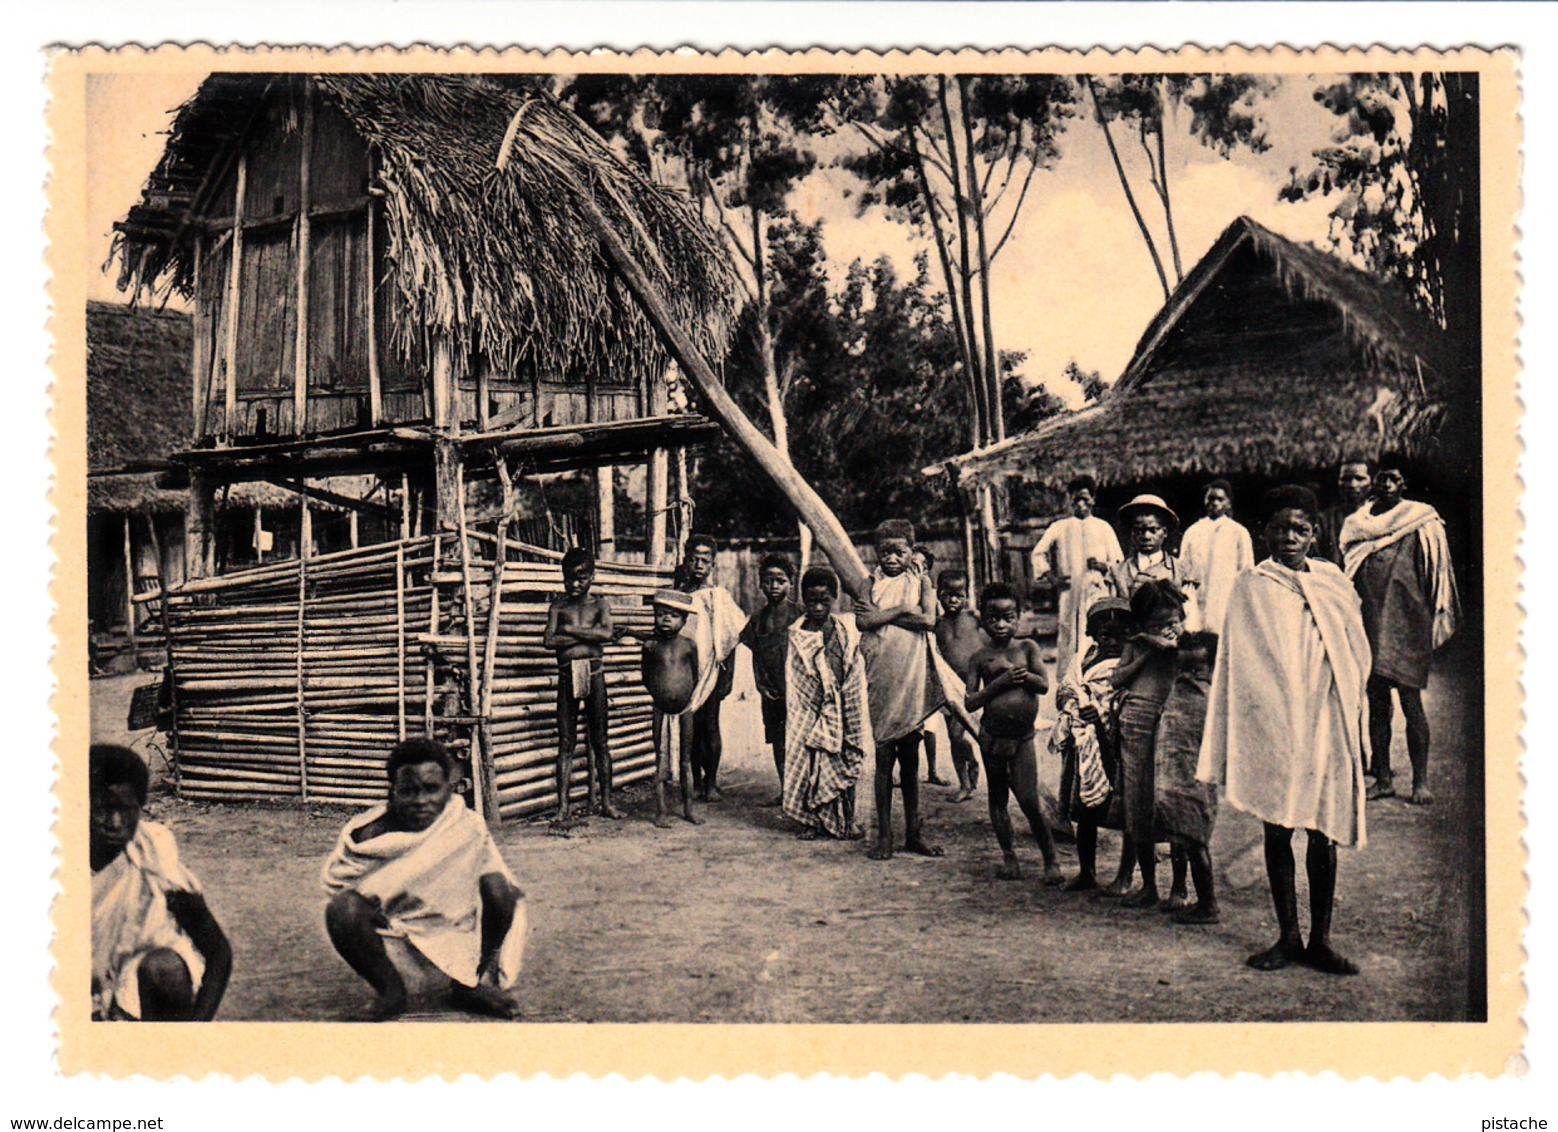 B&W - Madagascar Africa Afrique - Waiting For The Missionary - La Salette - Animation - Size 5 1/2 X 4 - 2 Scans - Madagascar